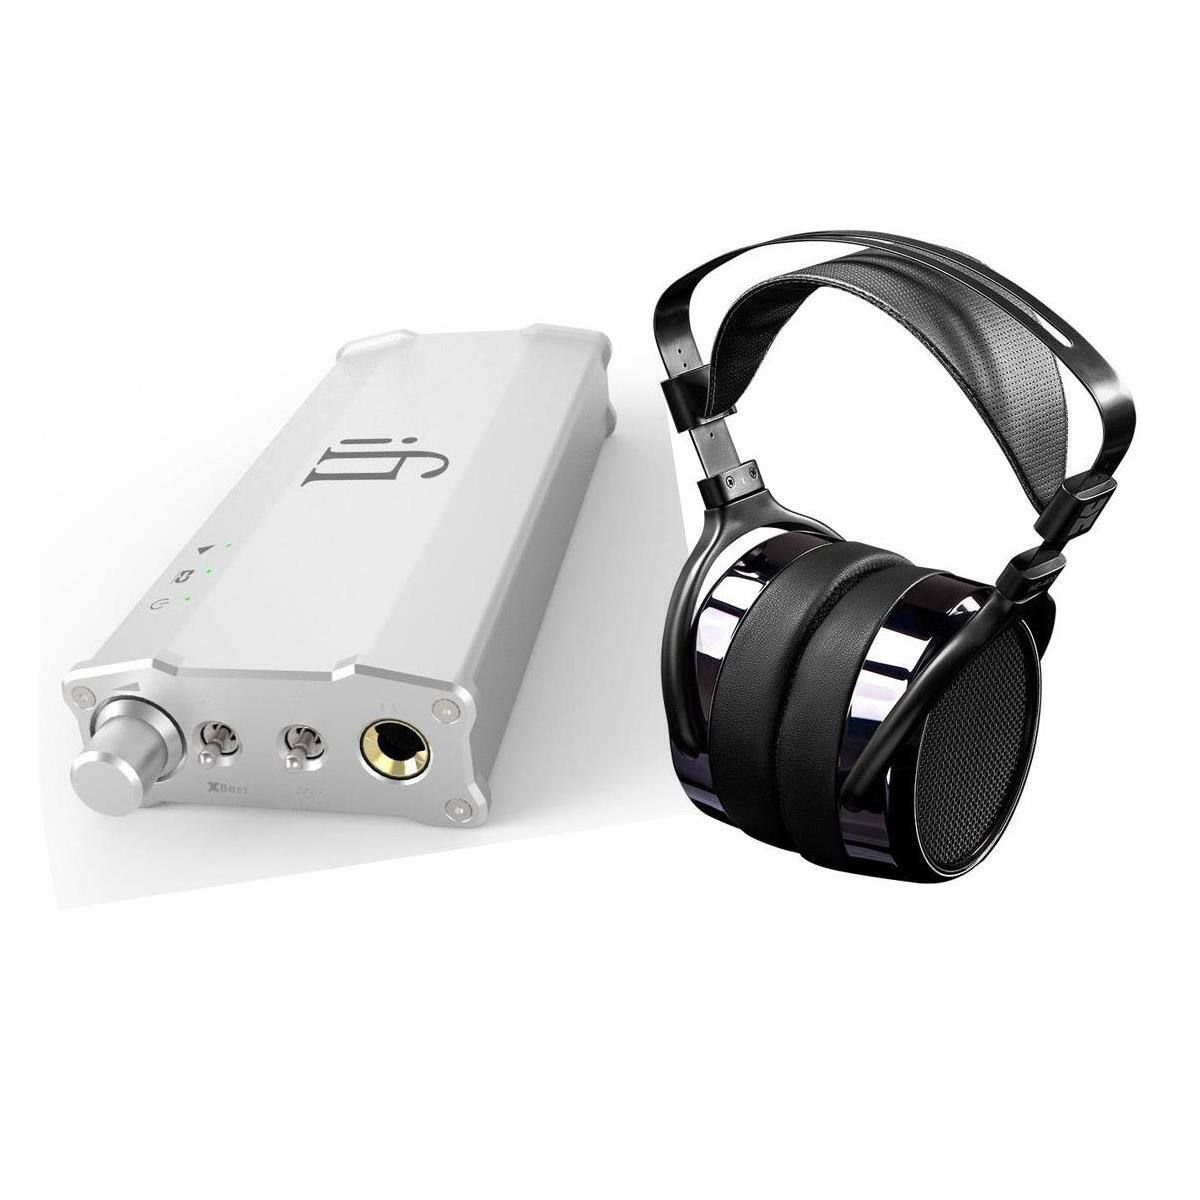 HiFiman: HE560 + Micro iDSD $900, HE400i + Micro iCAN SE Amp  $500 + Free S&H